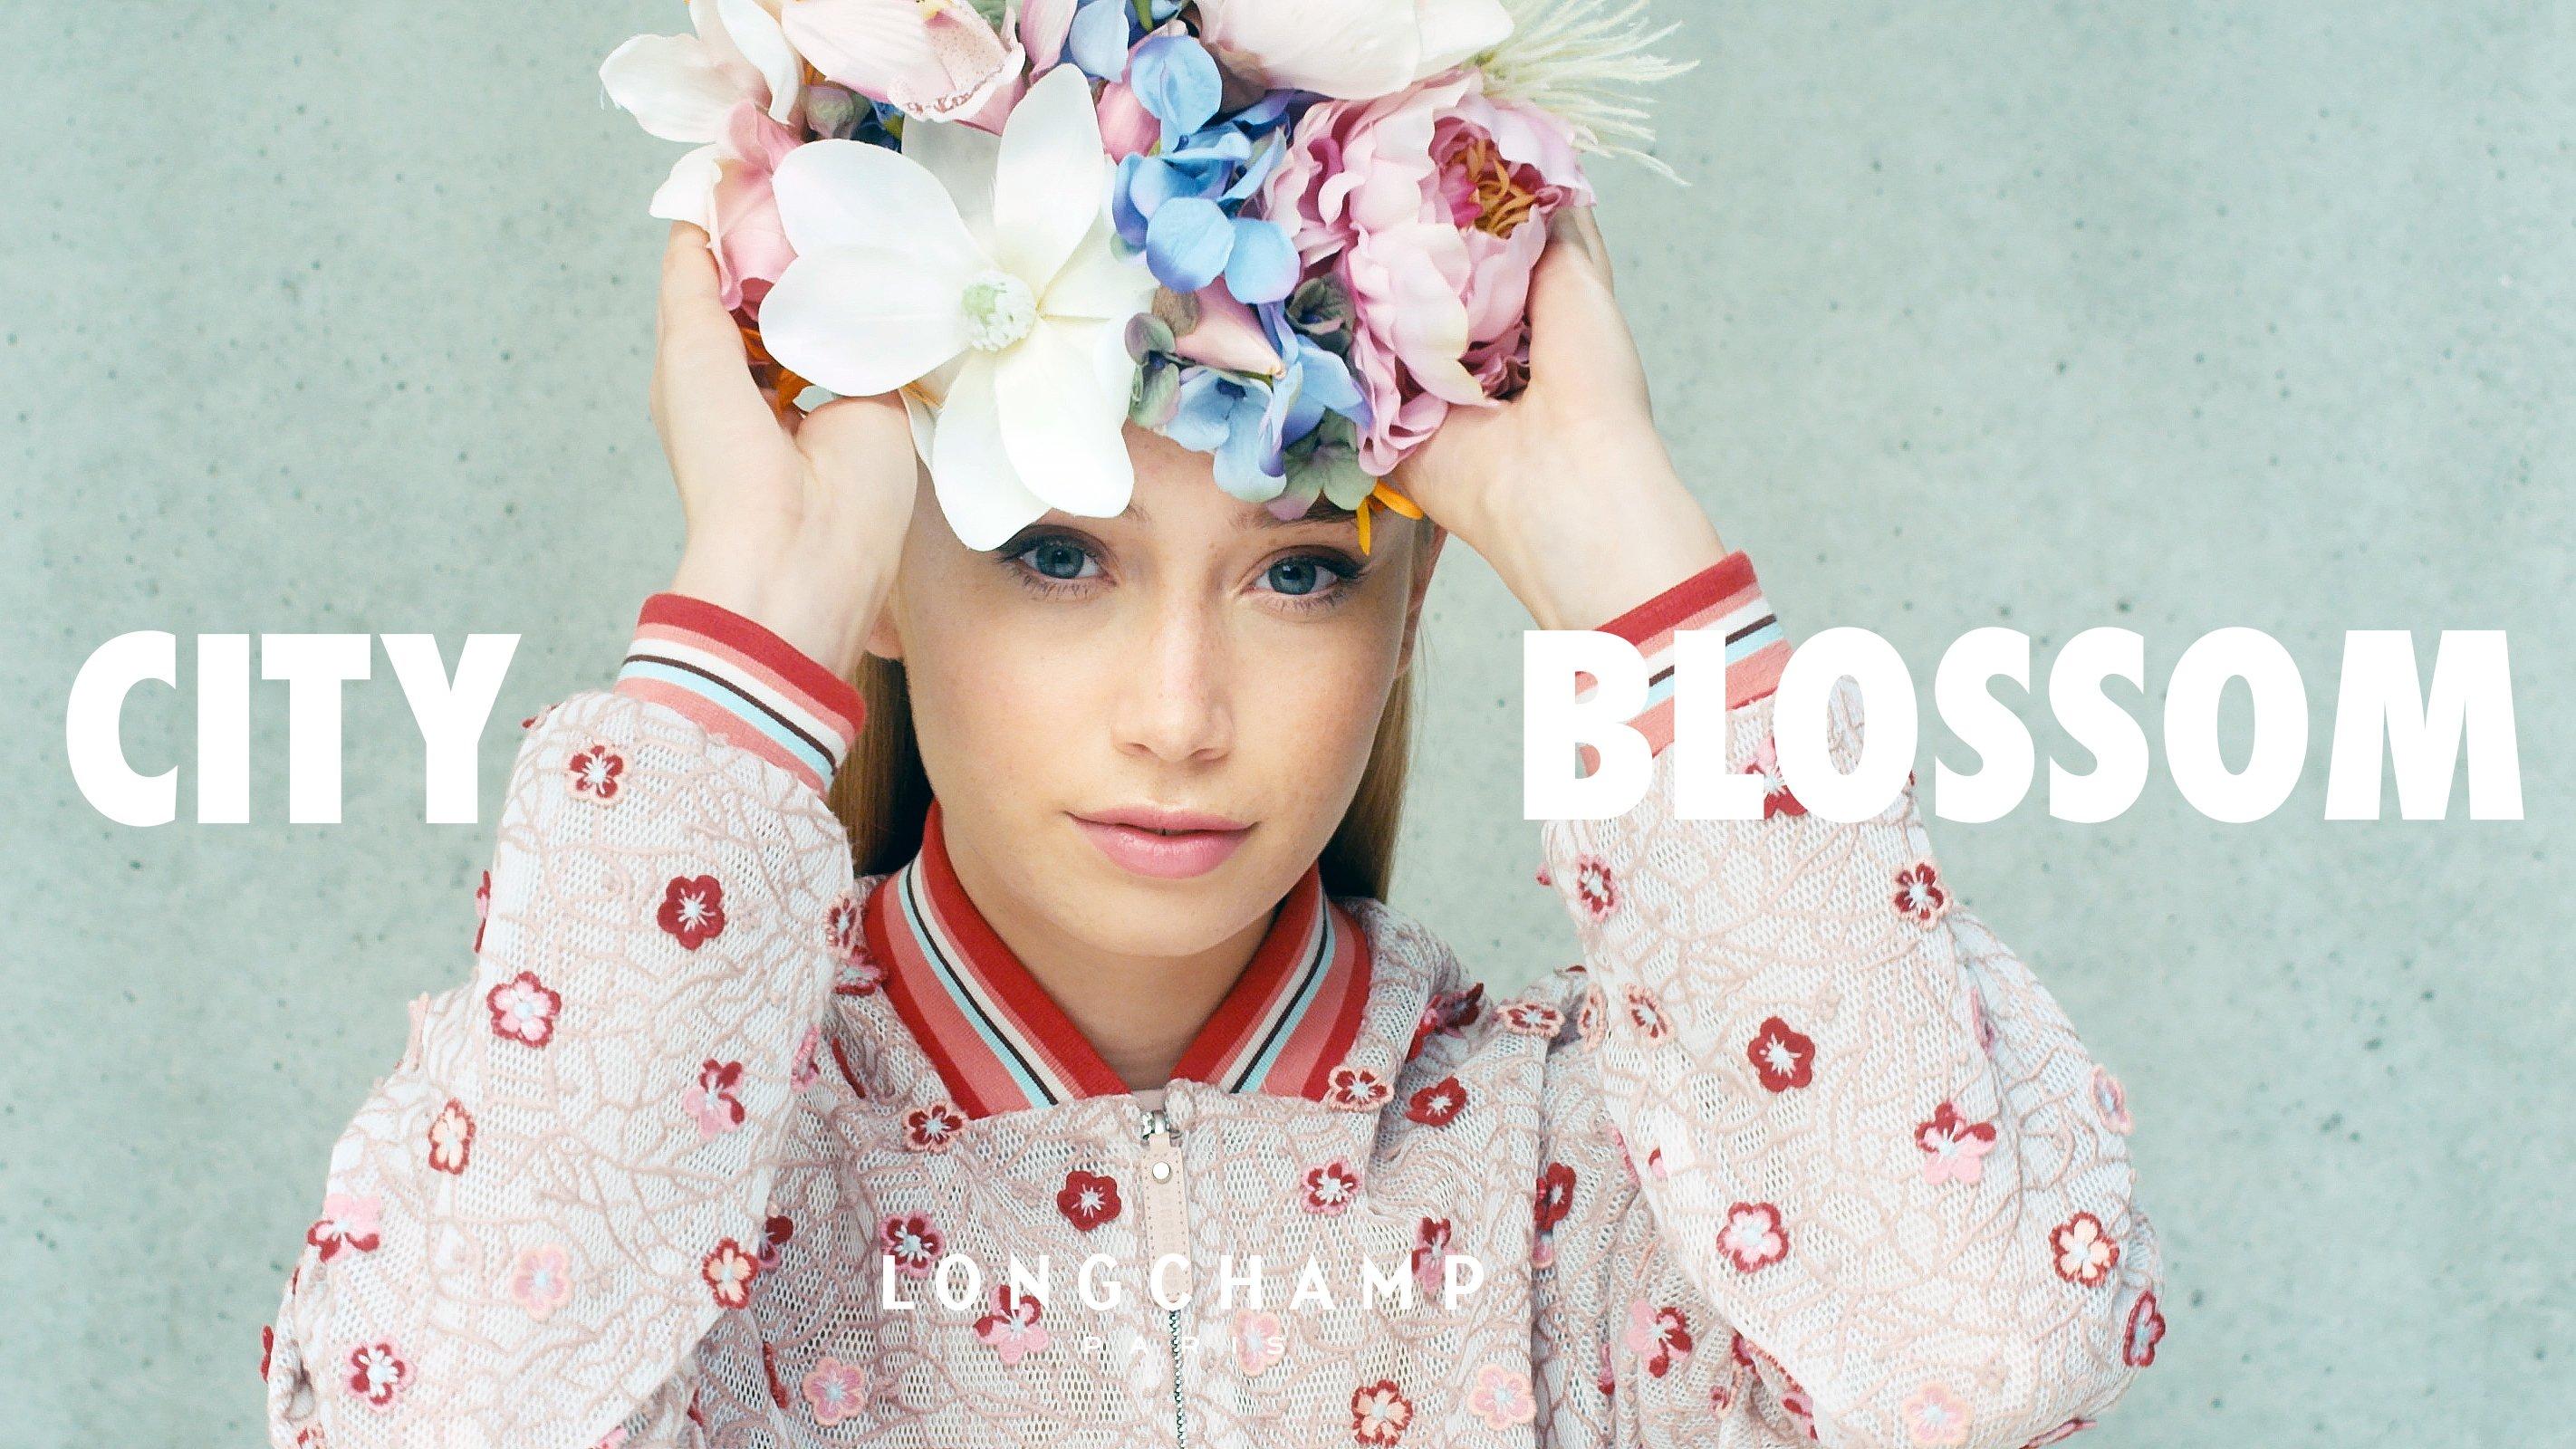 Roma Web Fest - Longchamp City Blossom